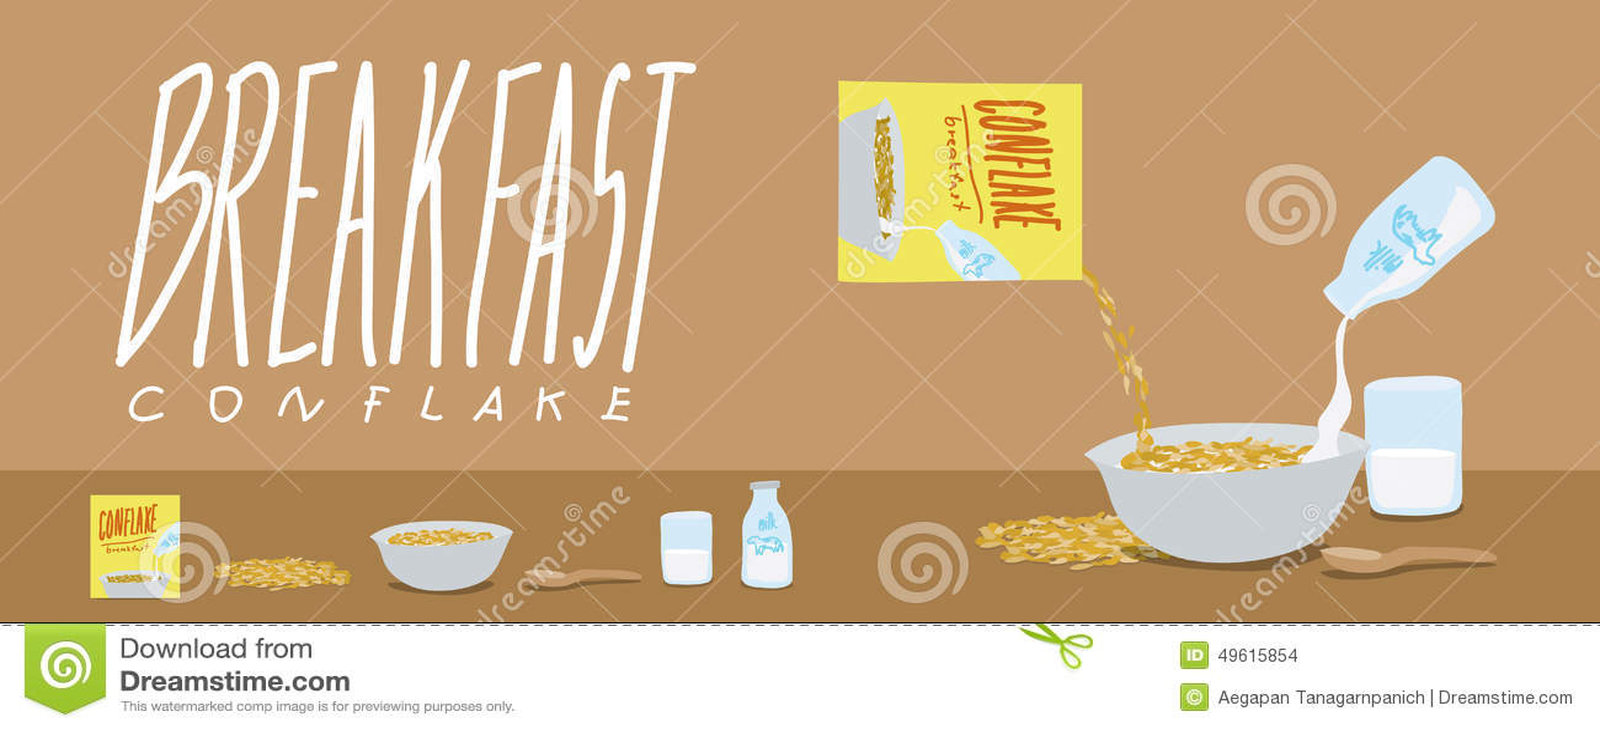 Healthy Breakfast-Cornflakes and Milk Splash Vector